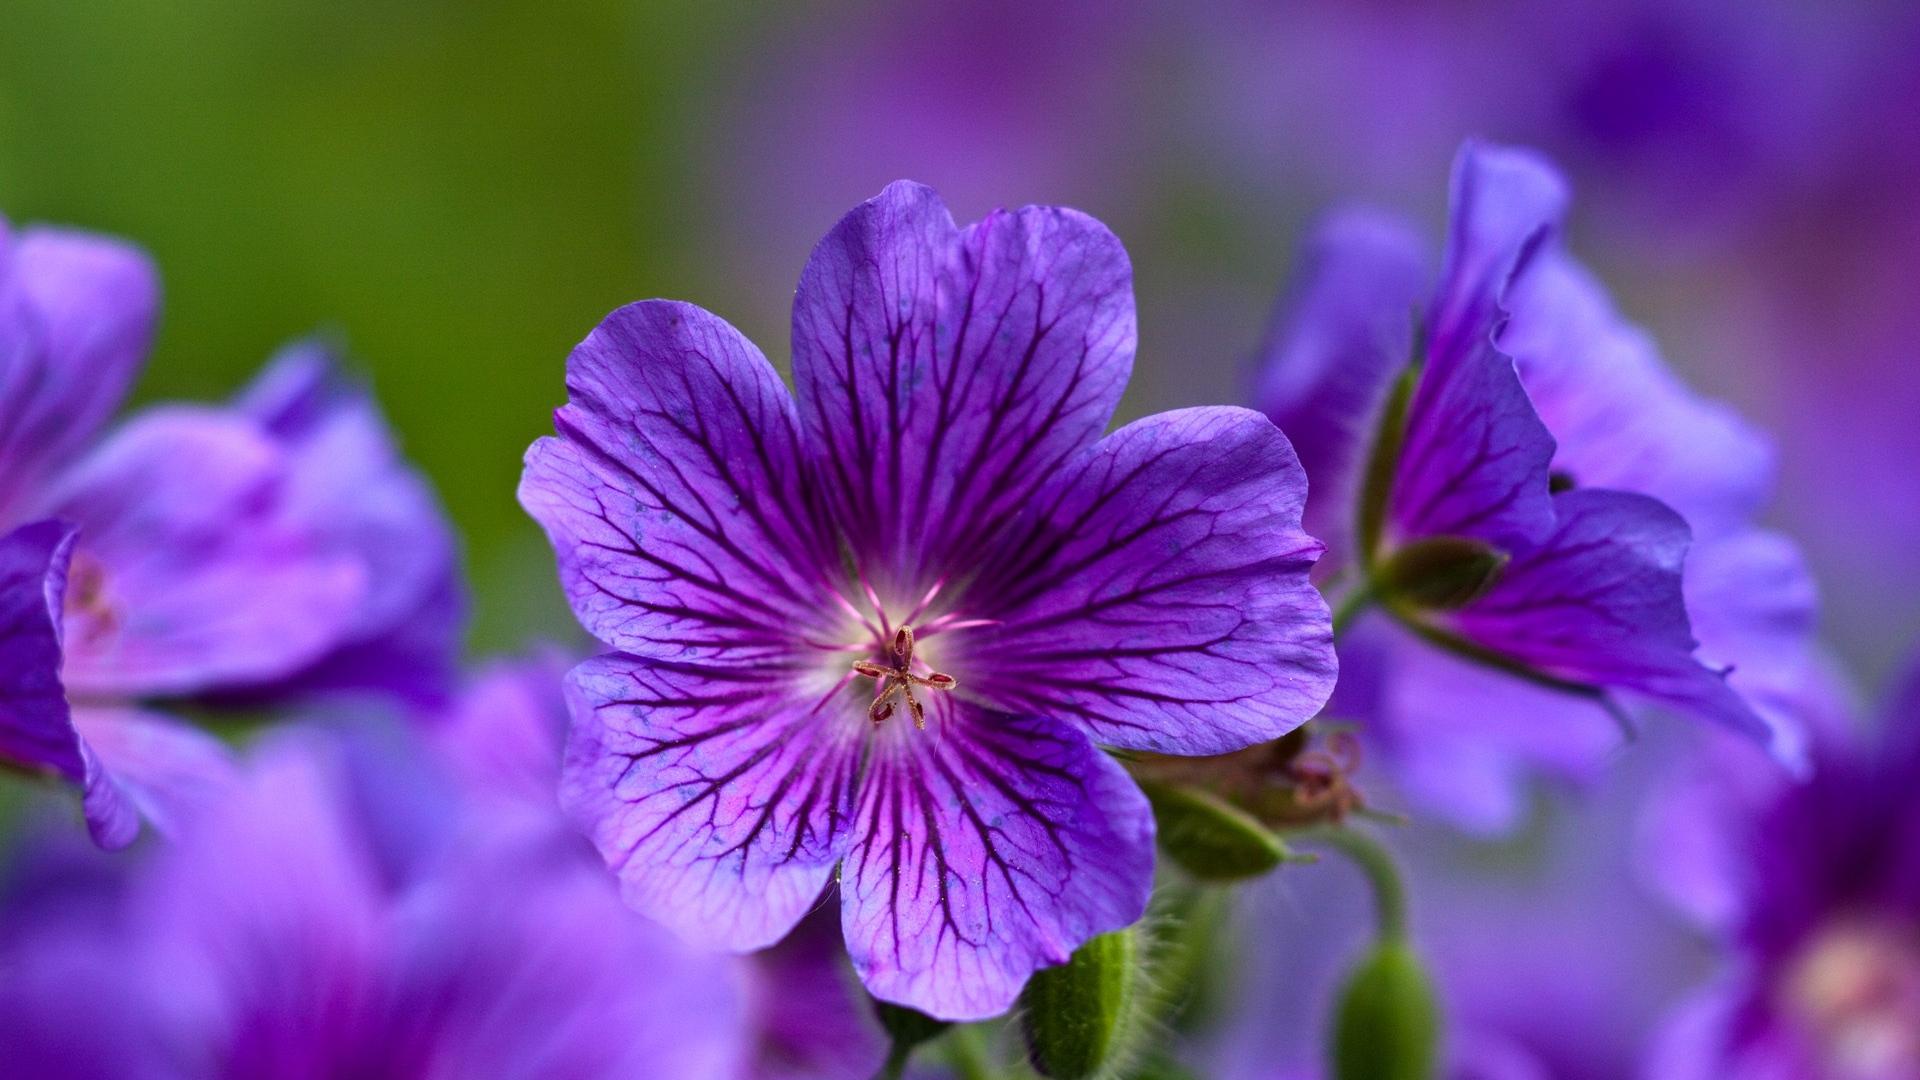 Download Wallpaper 1920x1080 Violet Flowers Close Up Petals Full Hd 1080p Hd Background